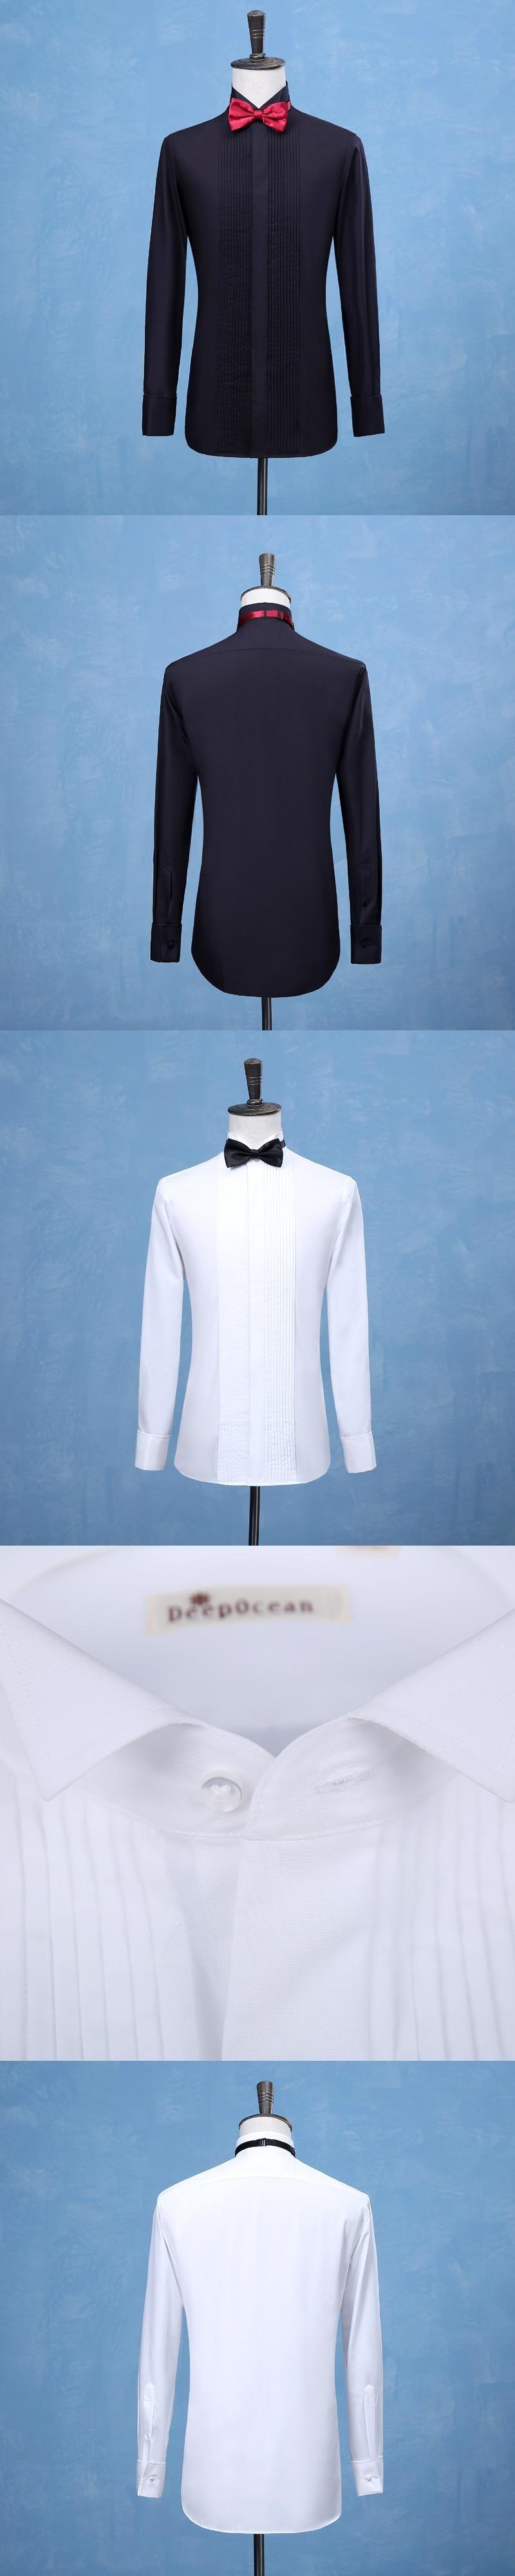 2017 New Fashion Groom Tuxedos Shirts Best Man Groomsmen White or ...